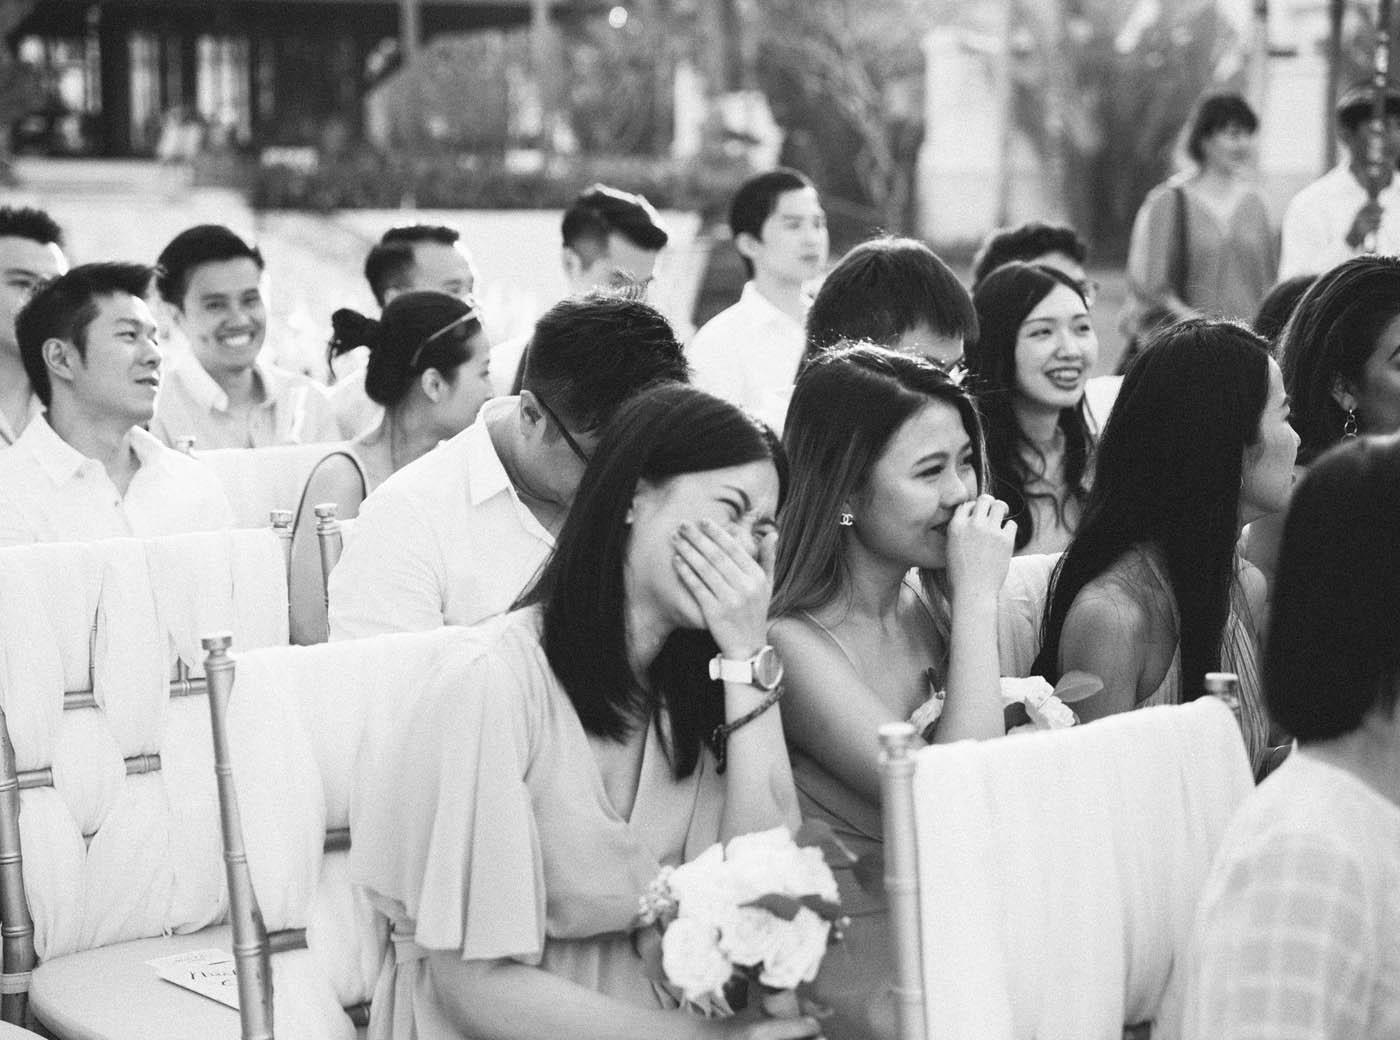 峇里島婚禮 -STAGE-fine-art-film-wedding-海外